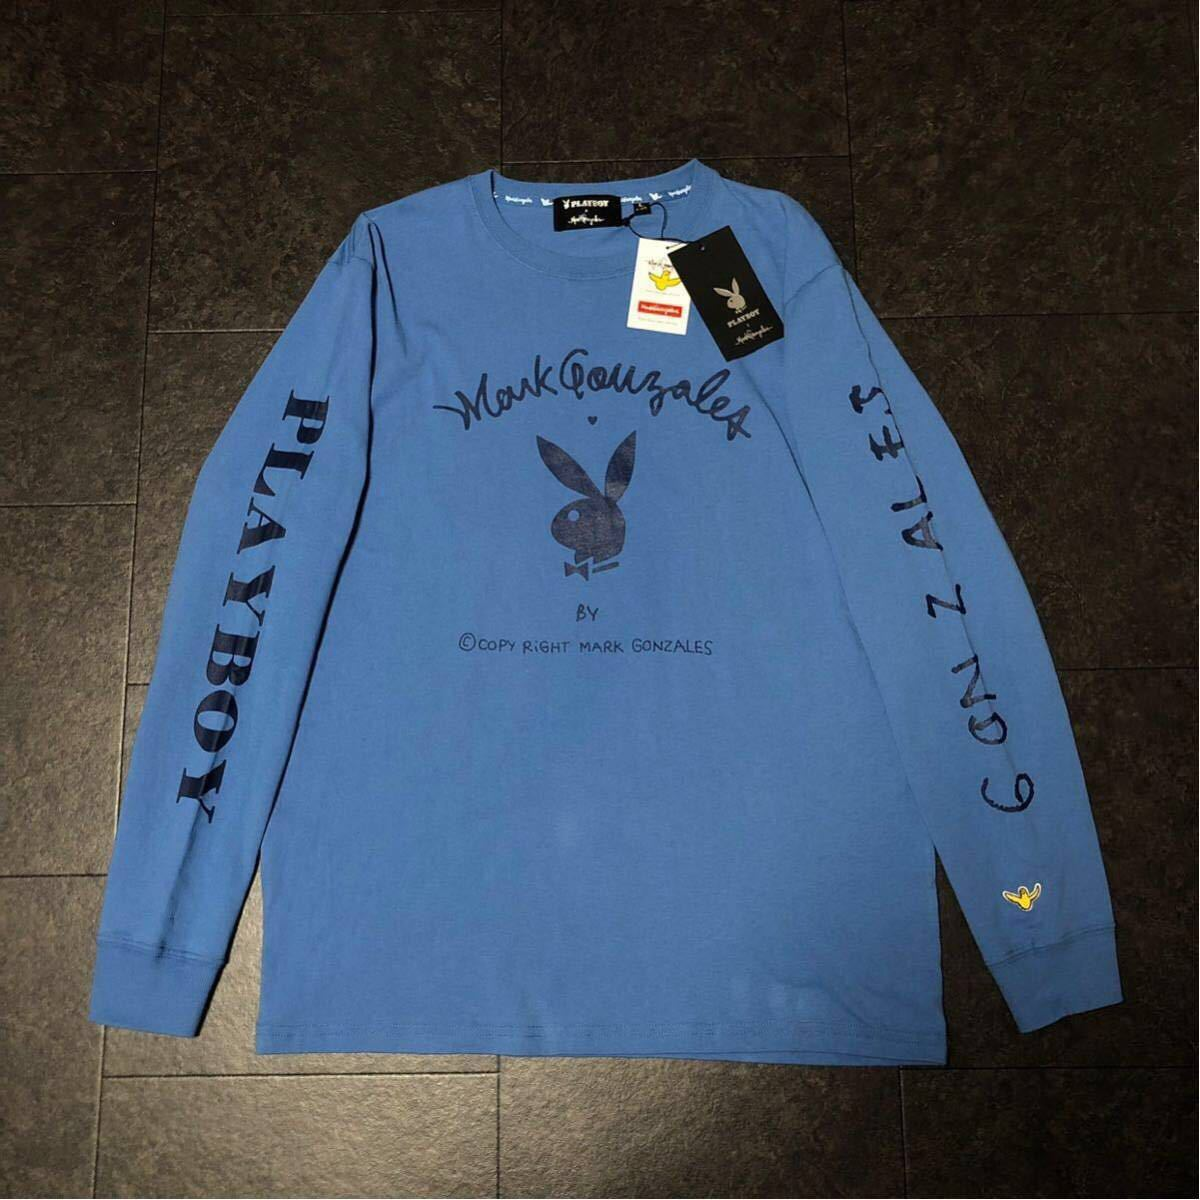 XL 定価6490円 送料無料 新品 マークゴンザレス プレイボーイ コラボ 長袖シャツ ロンT メンズ 春秋 ビッグロゴ 袖ロゴ ブルー